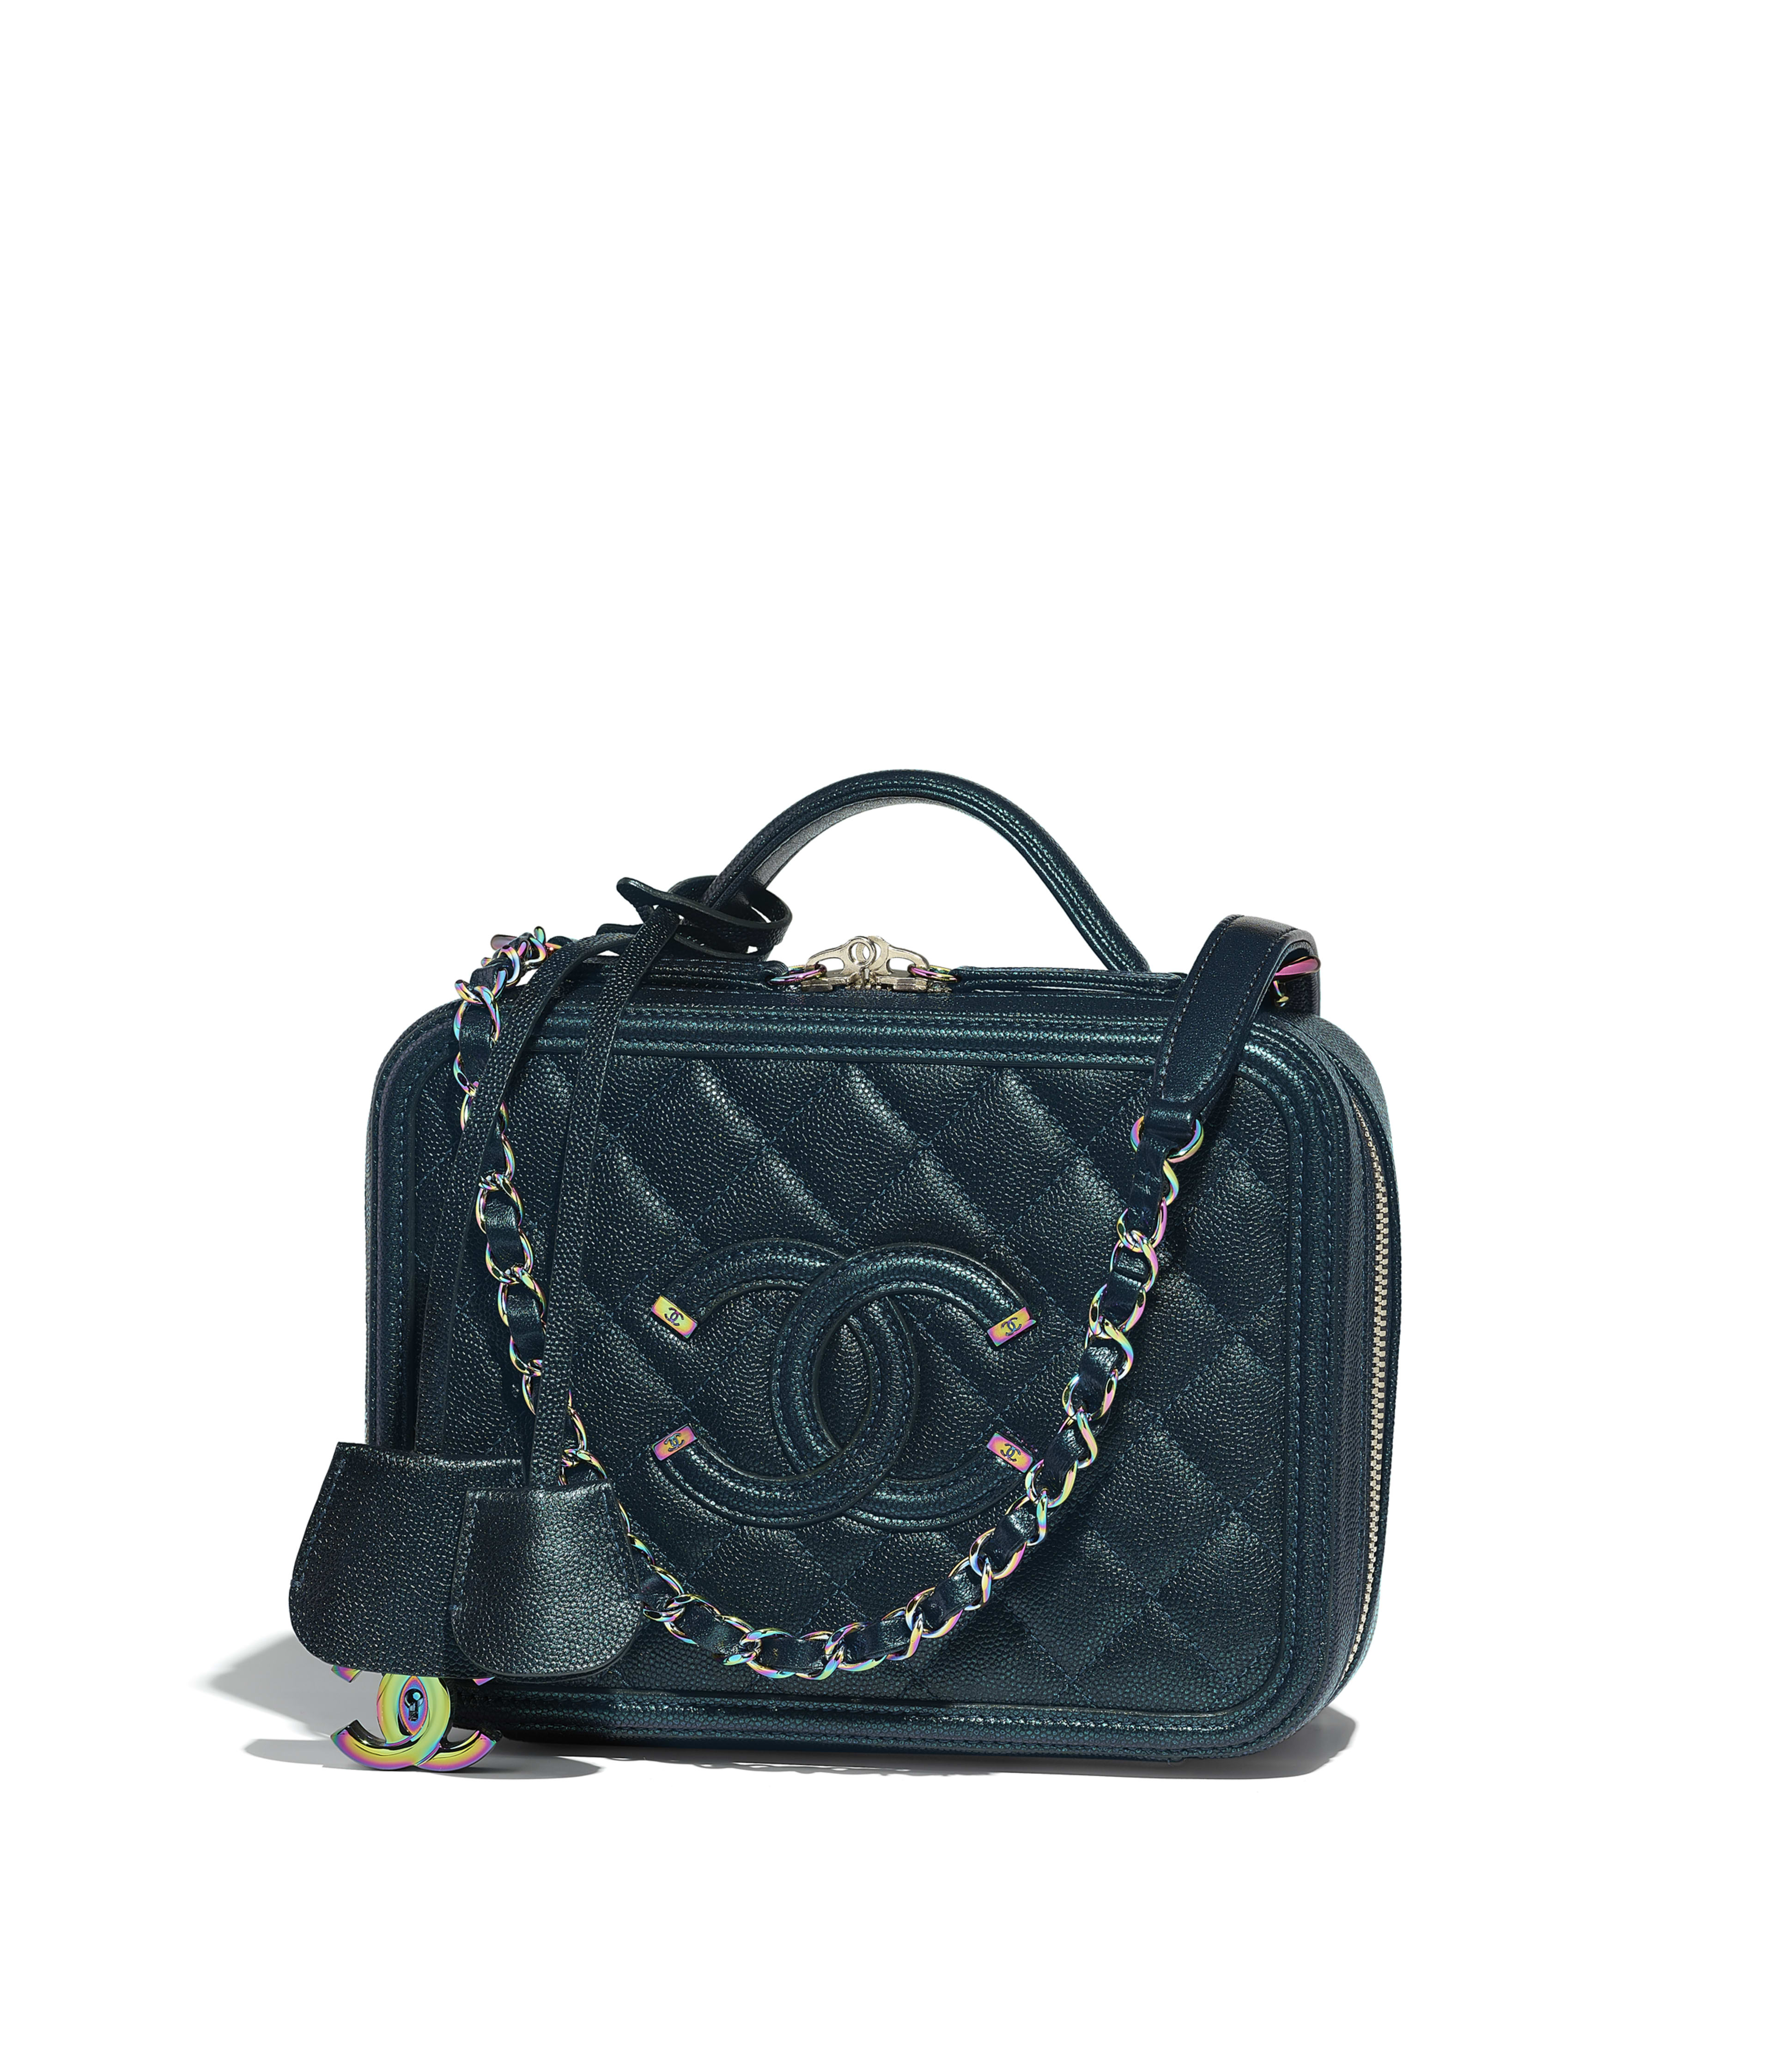 Handbags Fall Winter 2018 19 Pre Collection Chanel